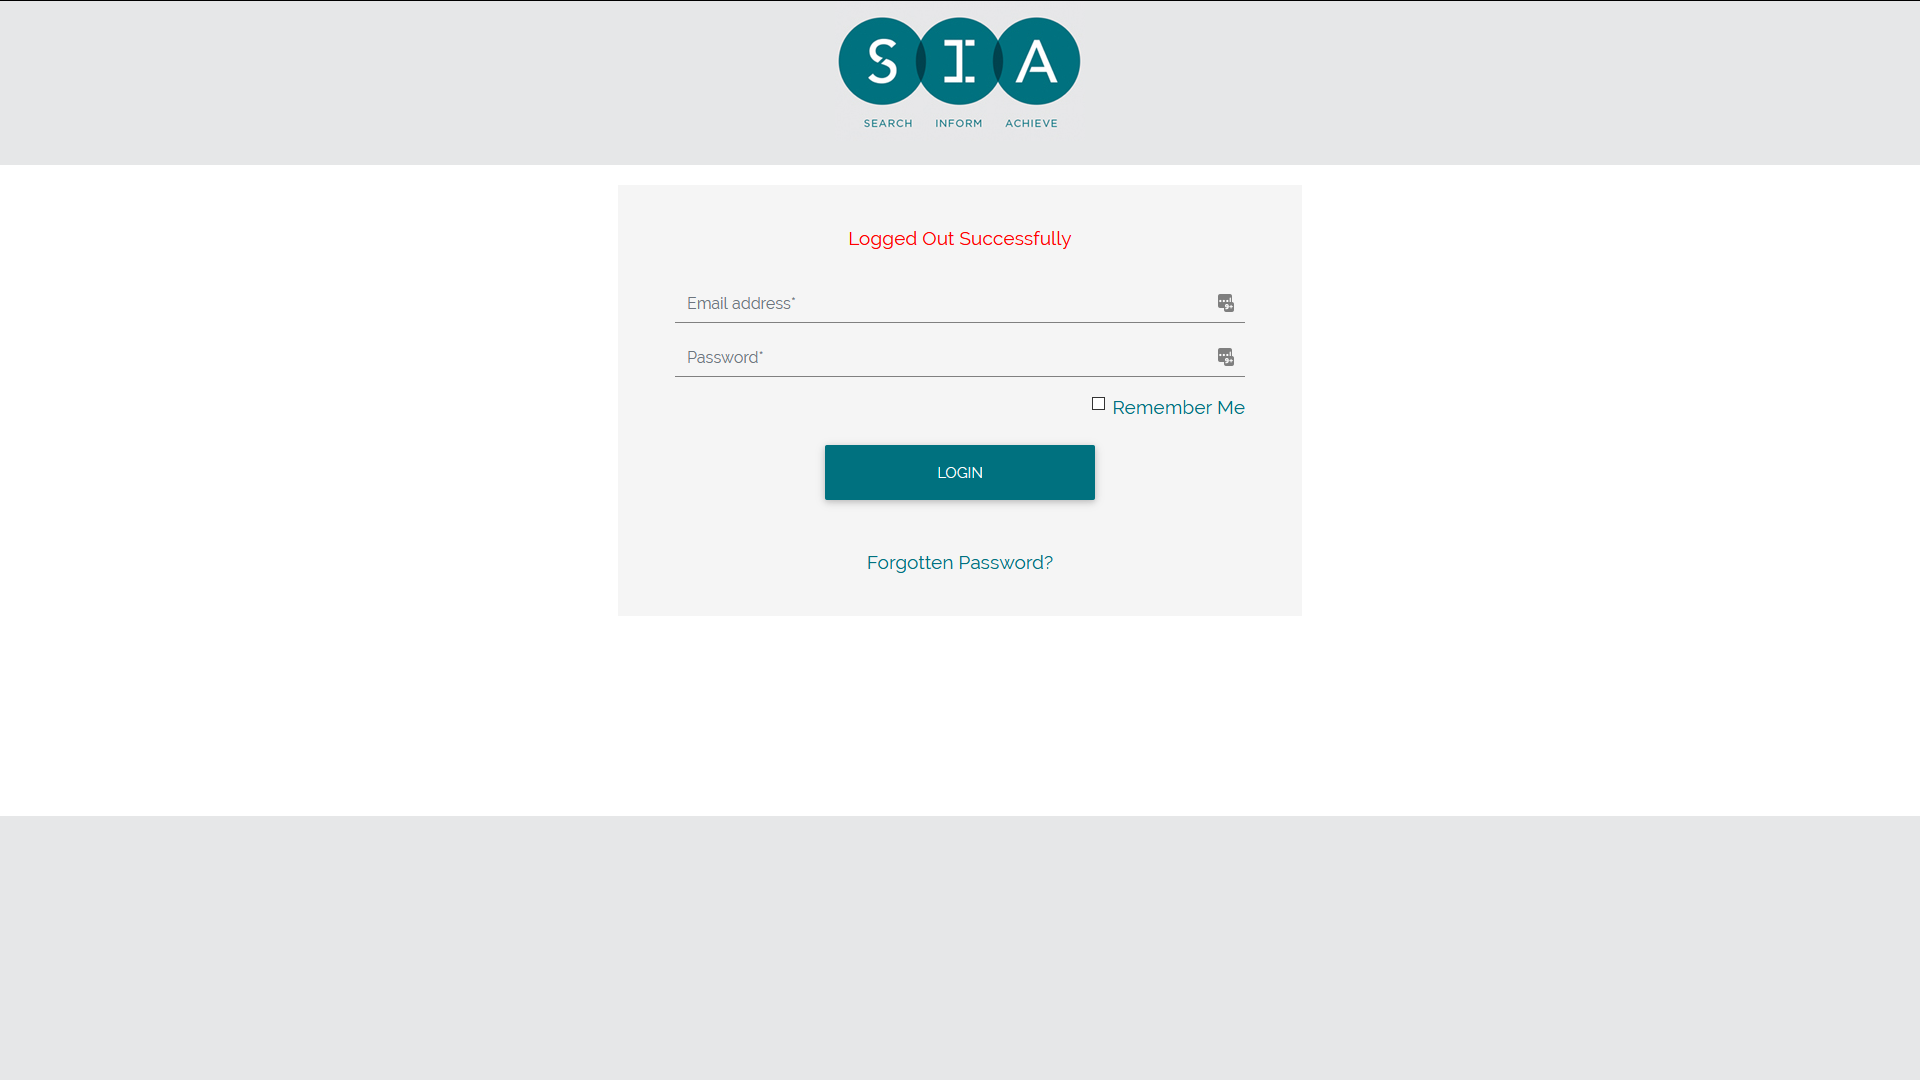 SIA digital asset management system